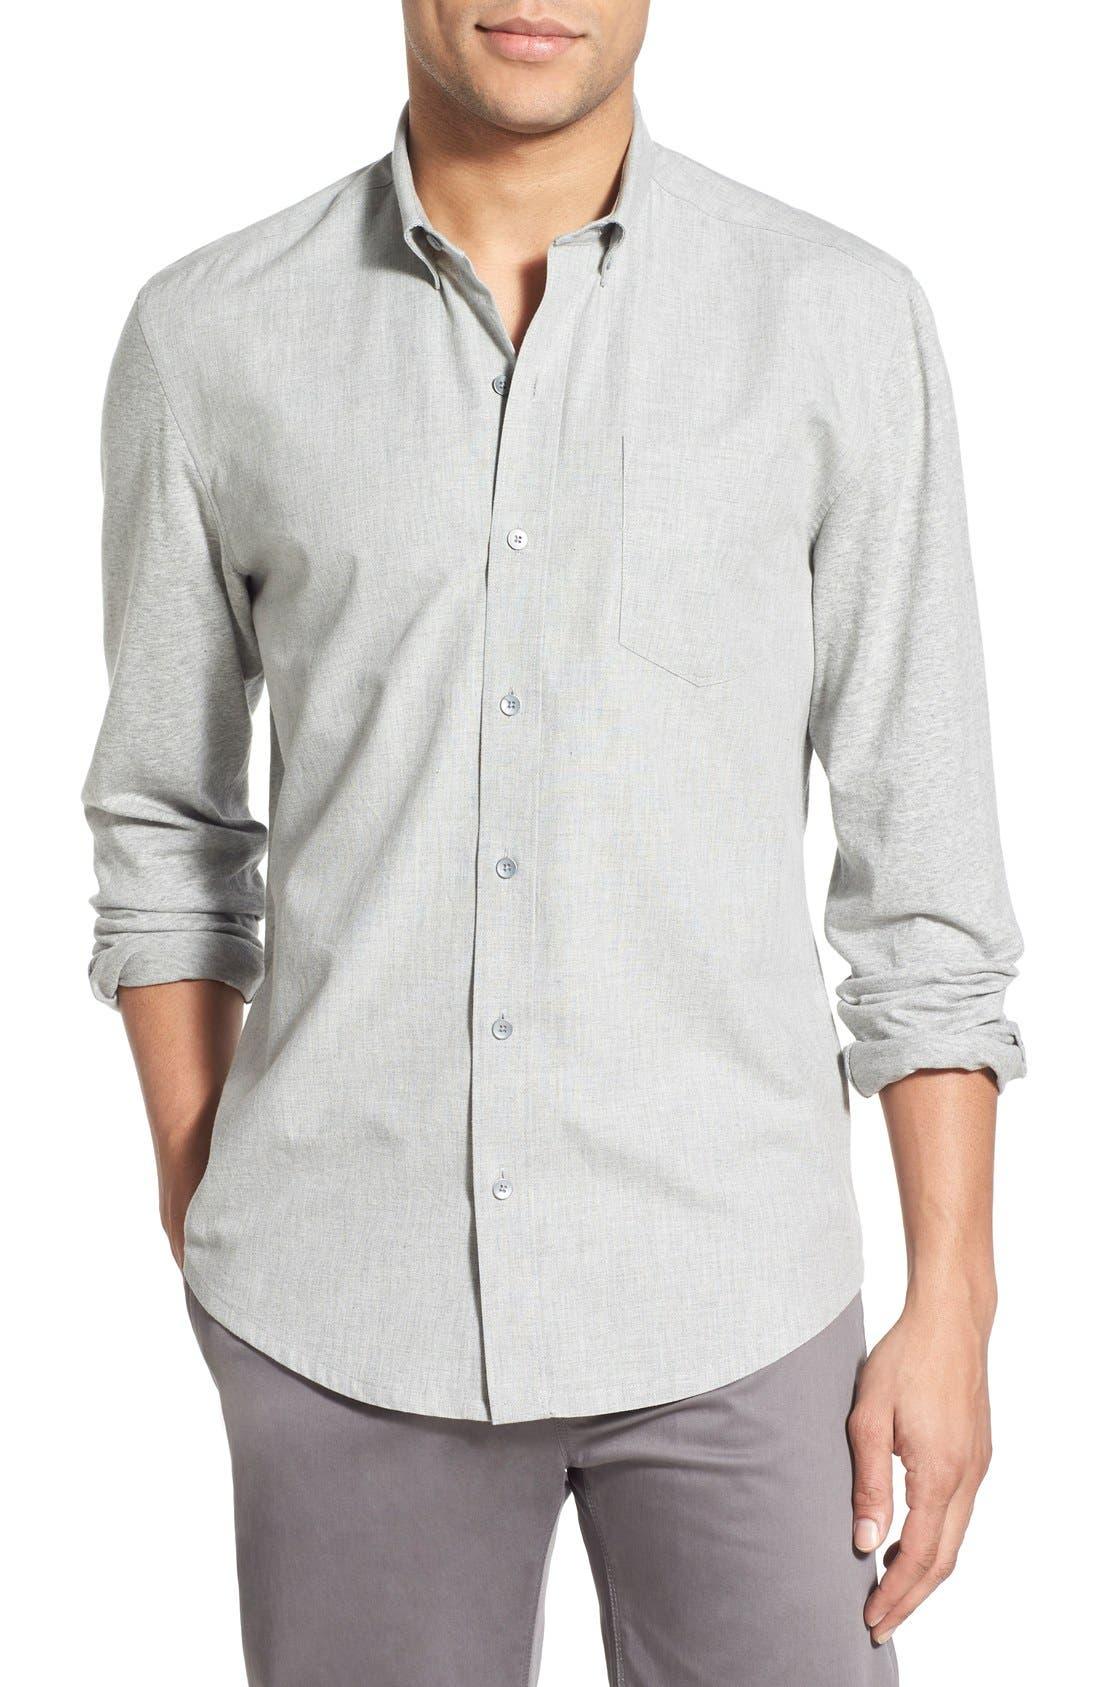 W.R.K 'Reworked' Trim Fit Sport Shirt